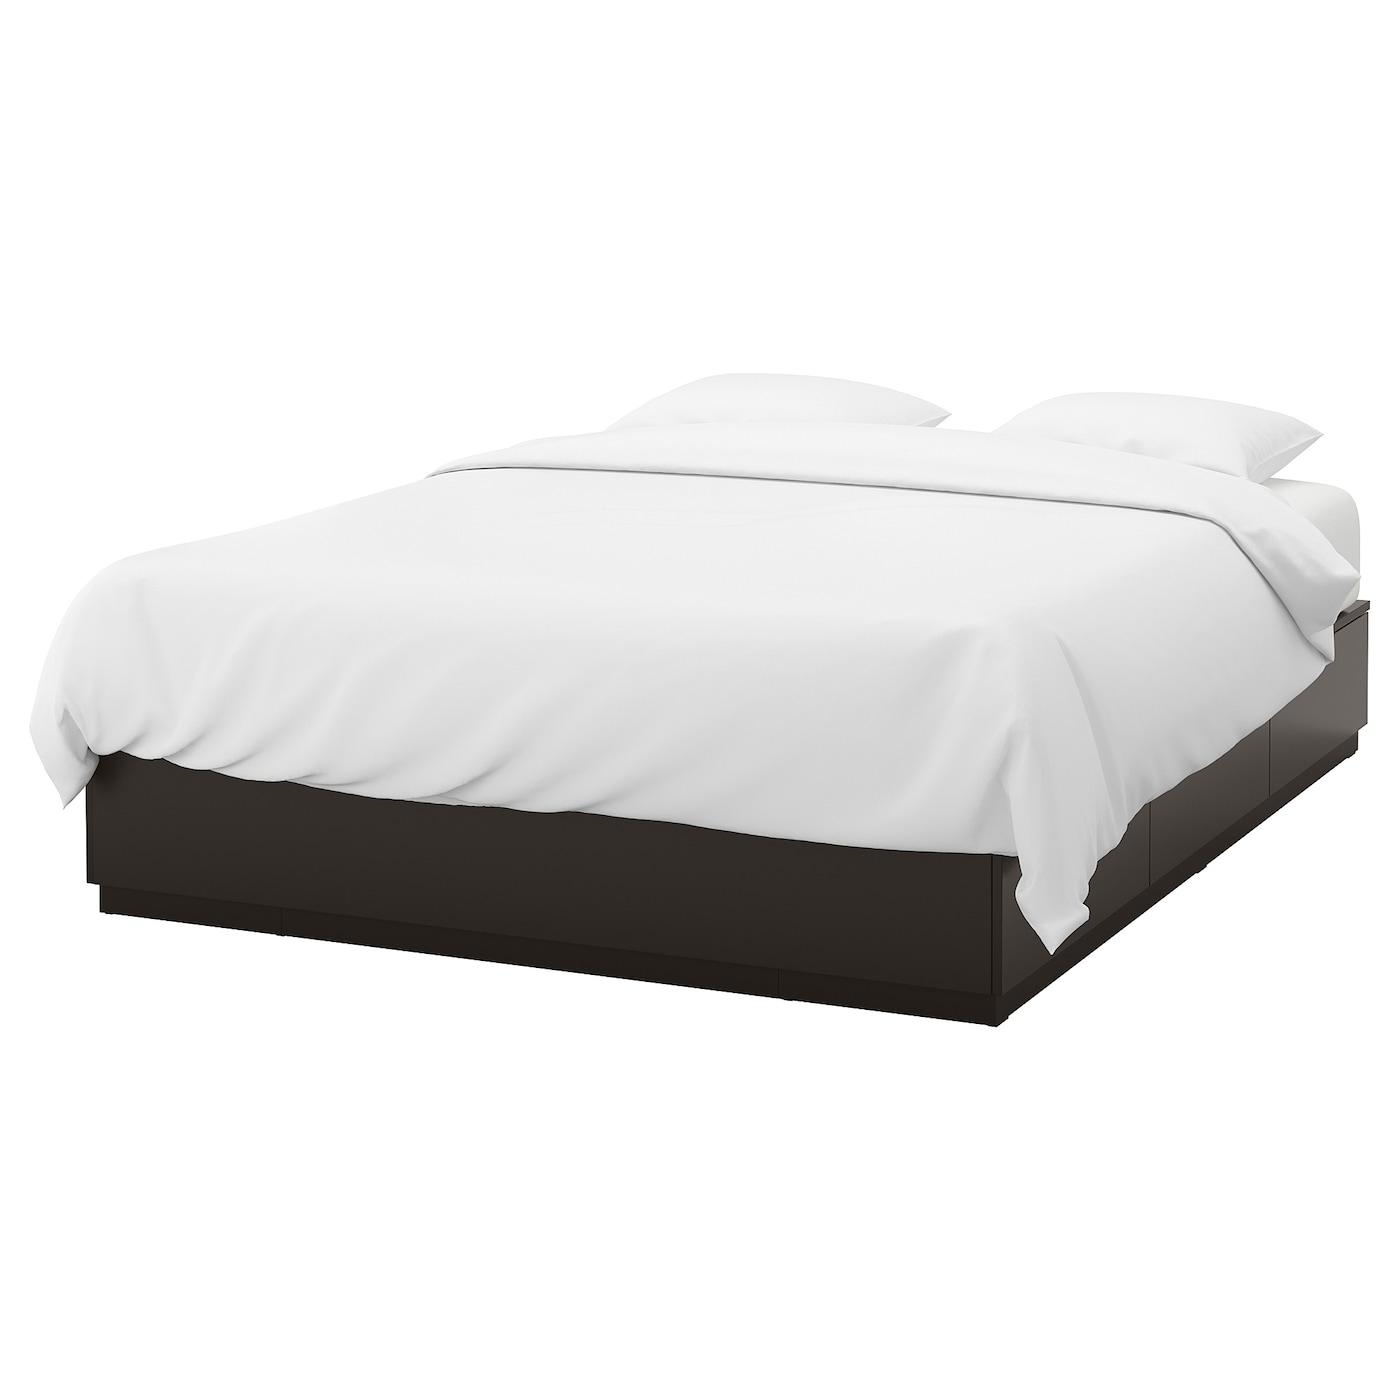 Nordli cadre lit avec rangement anthracite 140 x 200 cm ikea - Cadre de lit avec rangement ...